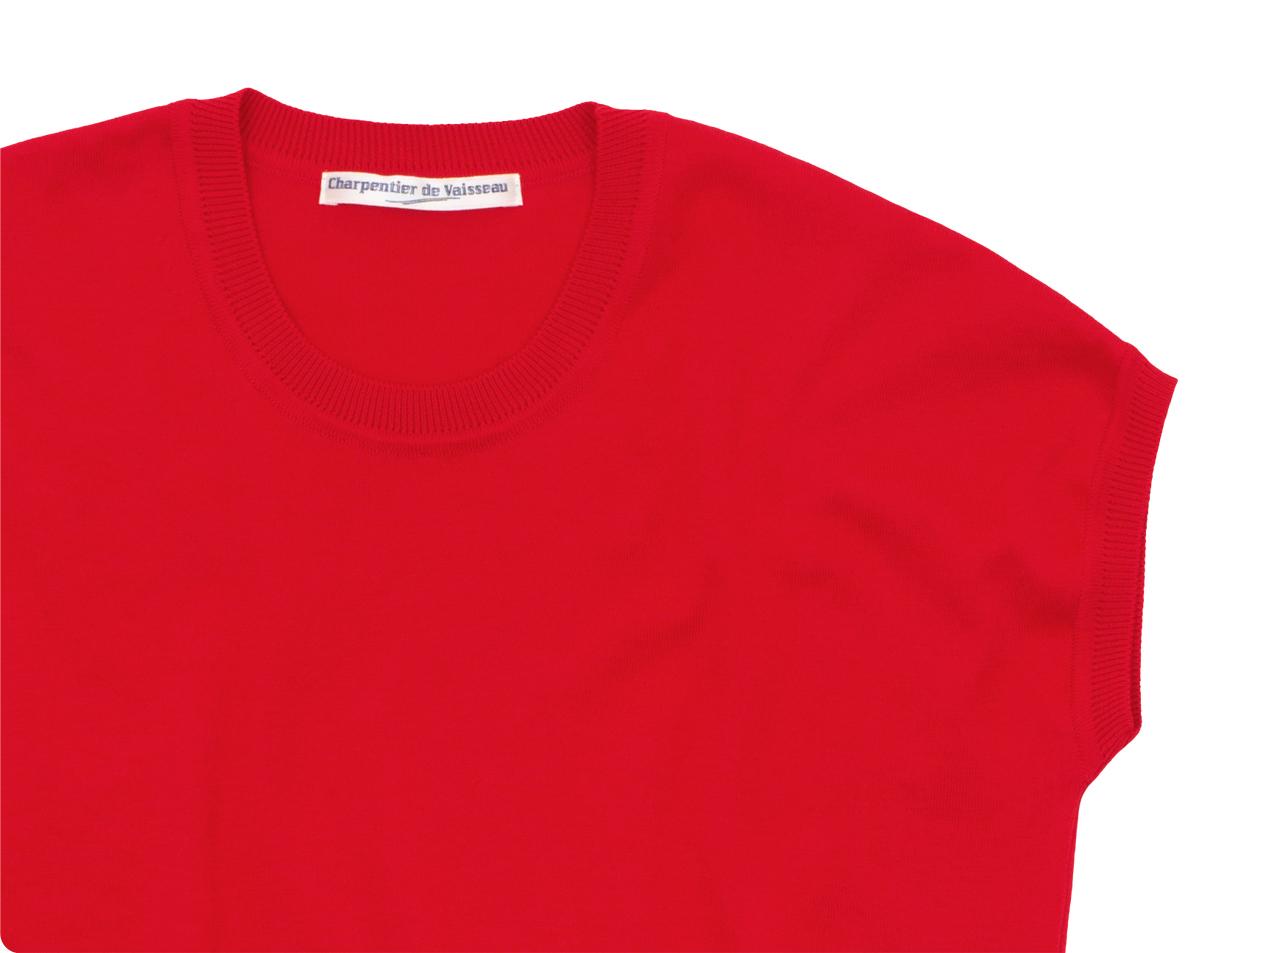 Charpentier de Vaisseau Klera Cotton Knit French Sleeve